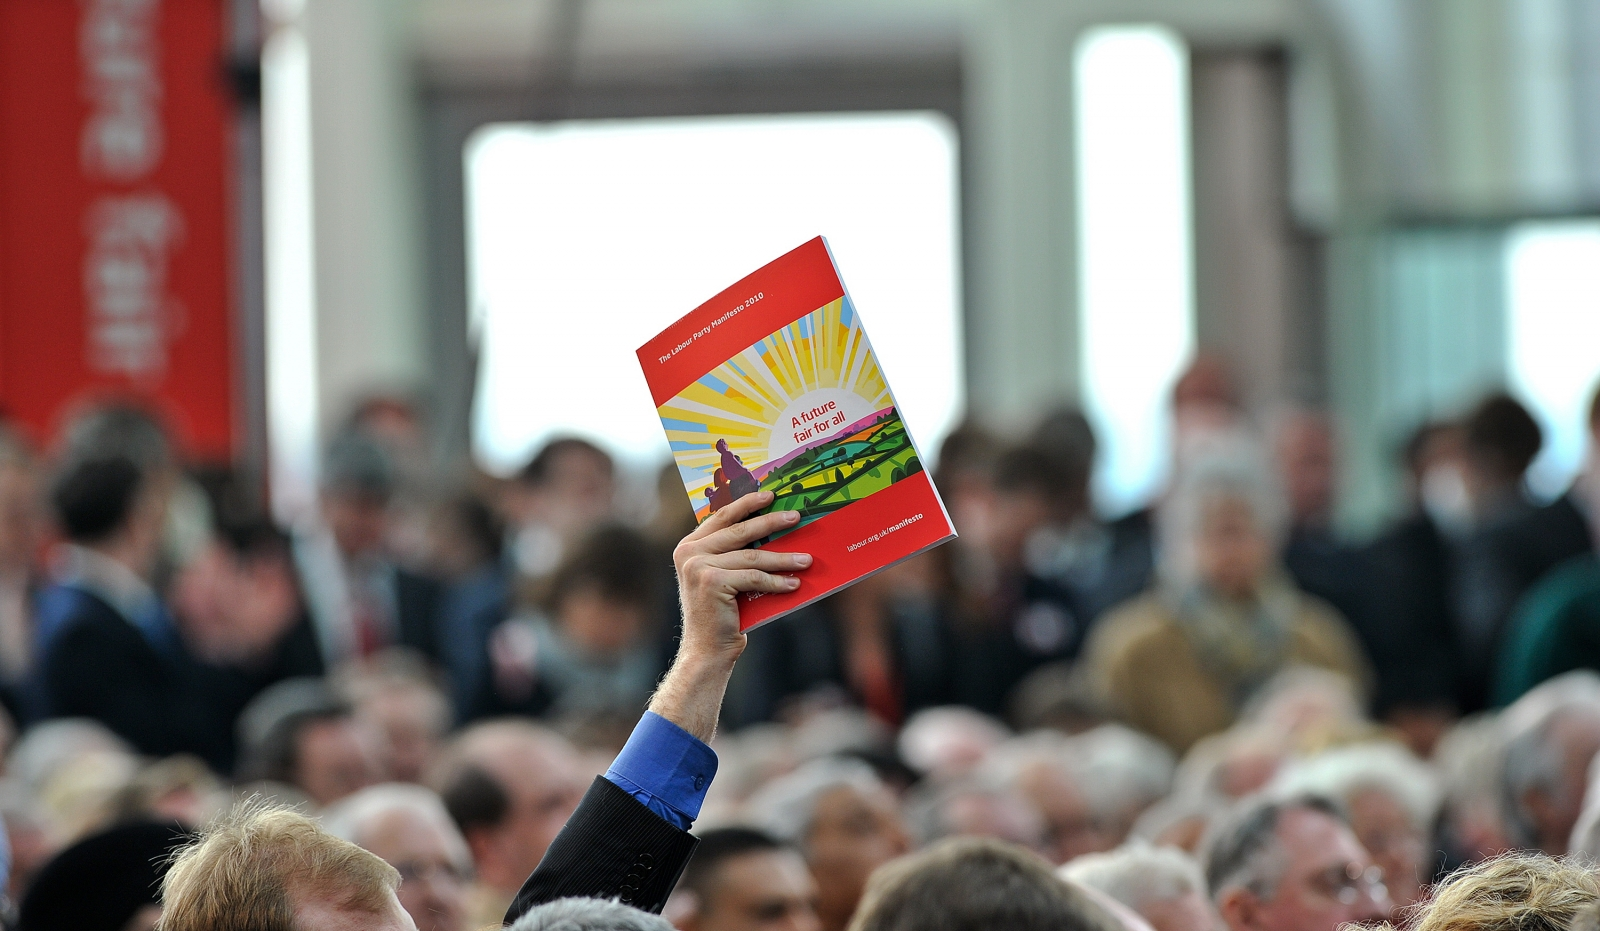 Labour 2010 manifesto